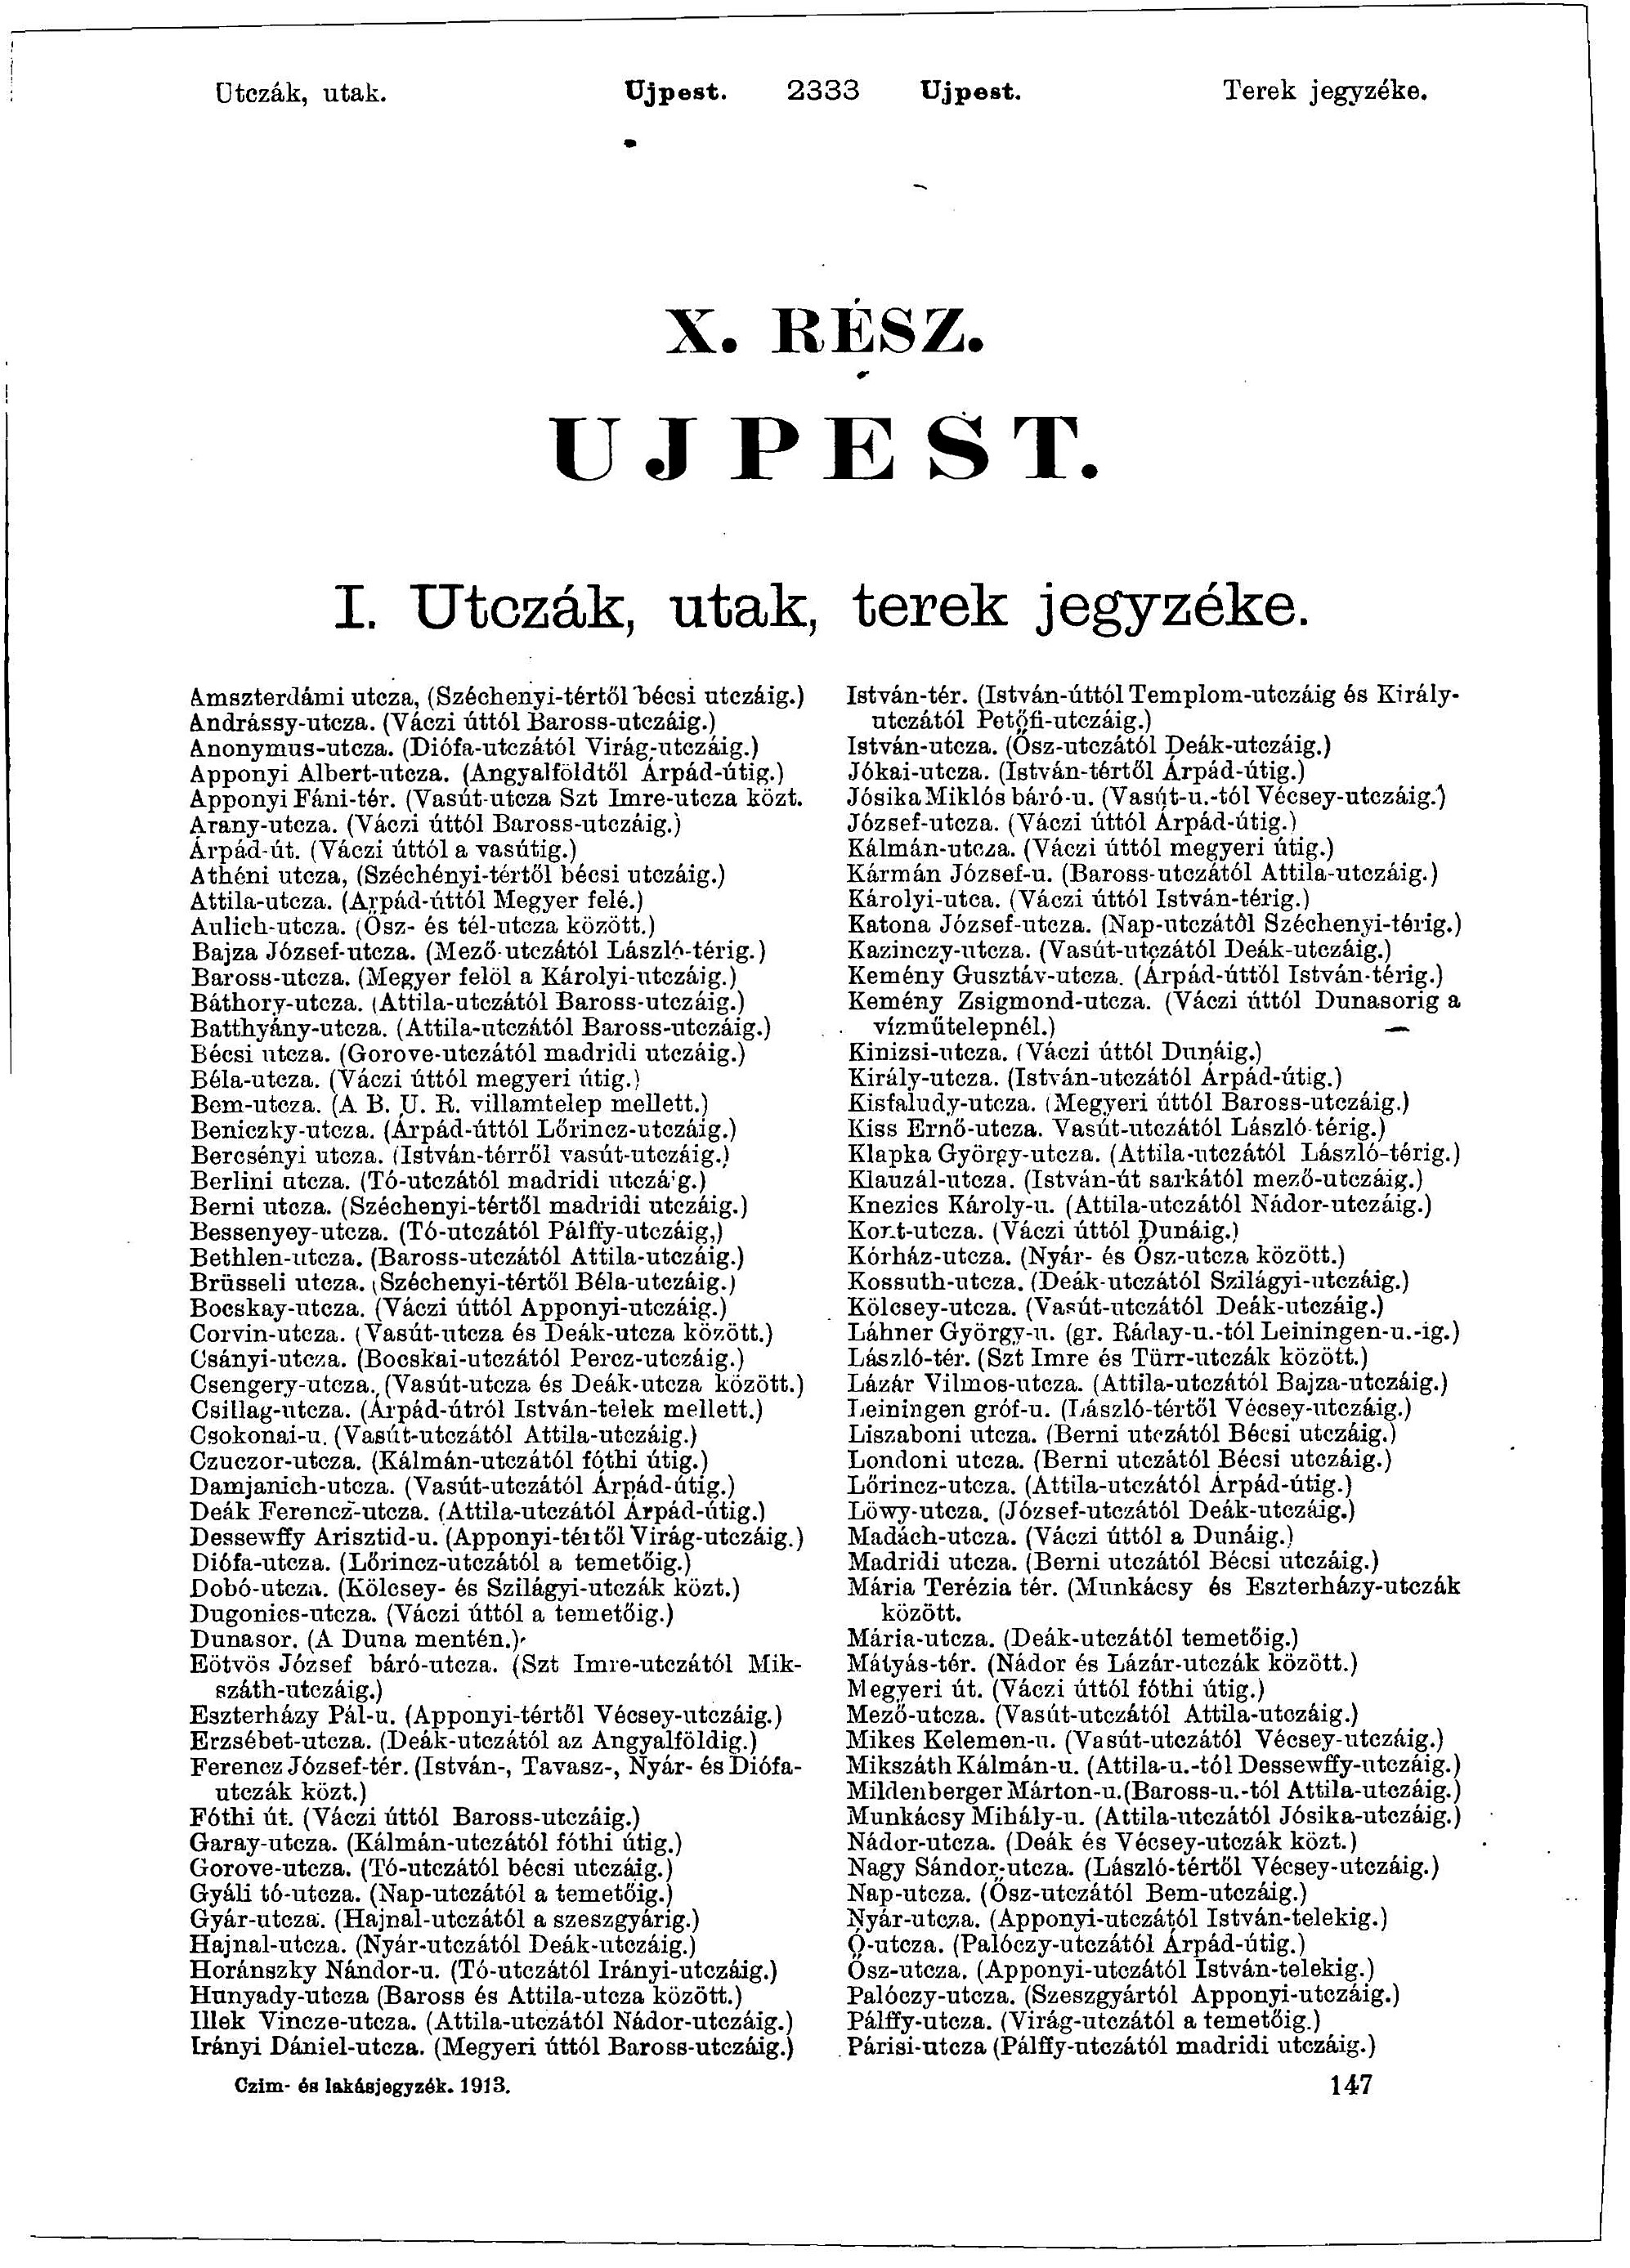 bplakcimjegyzek_25_1913_pages2410-2410.jpg